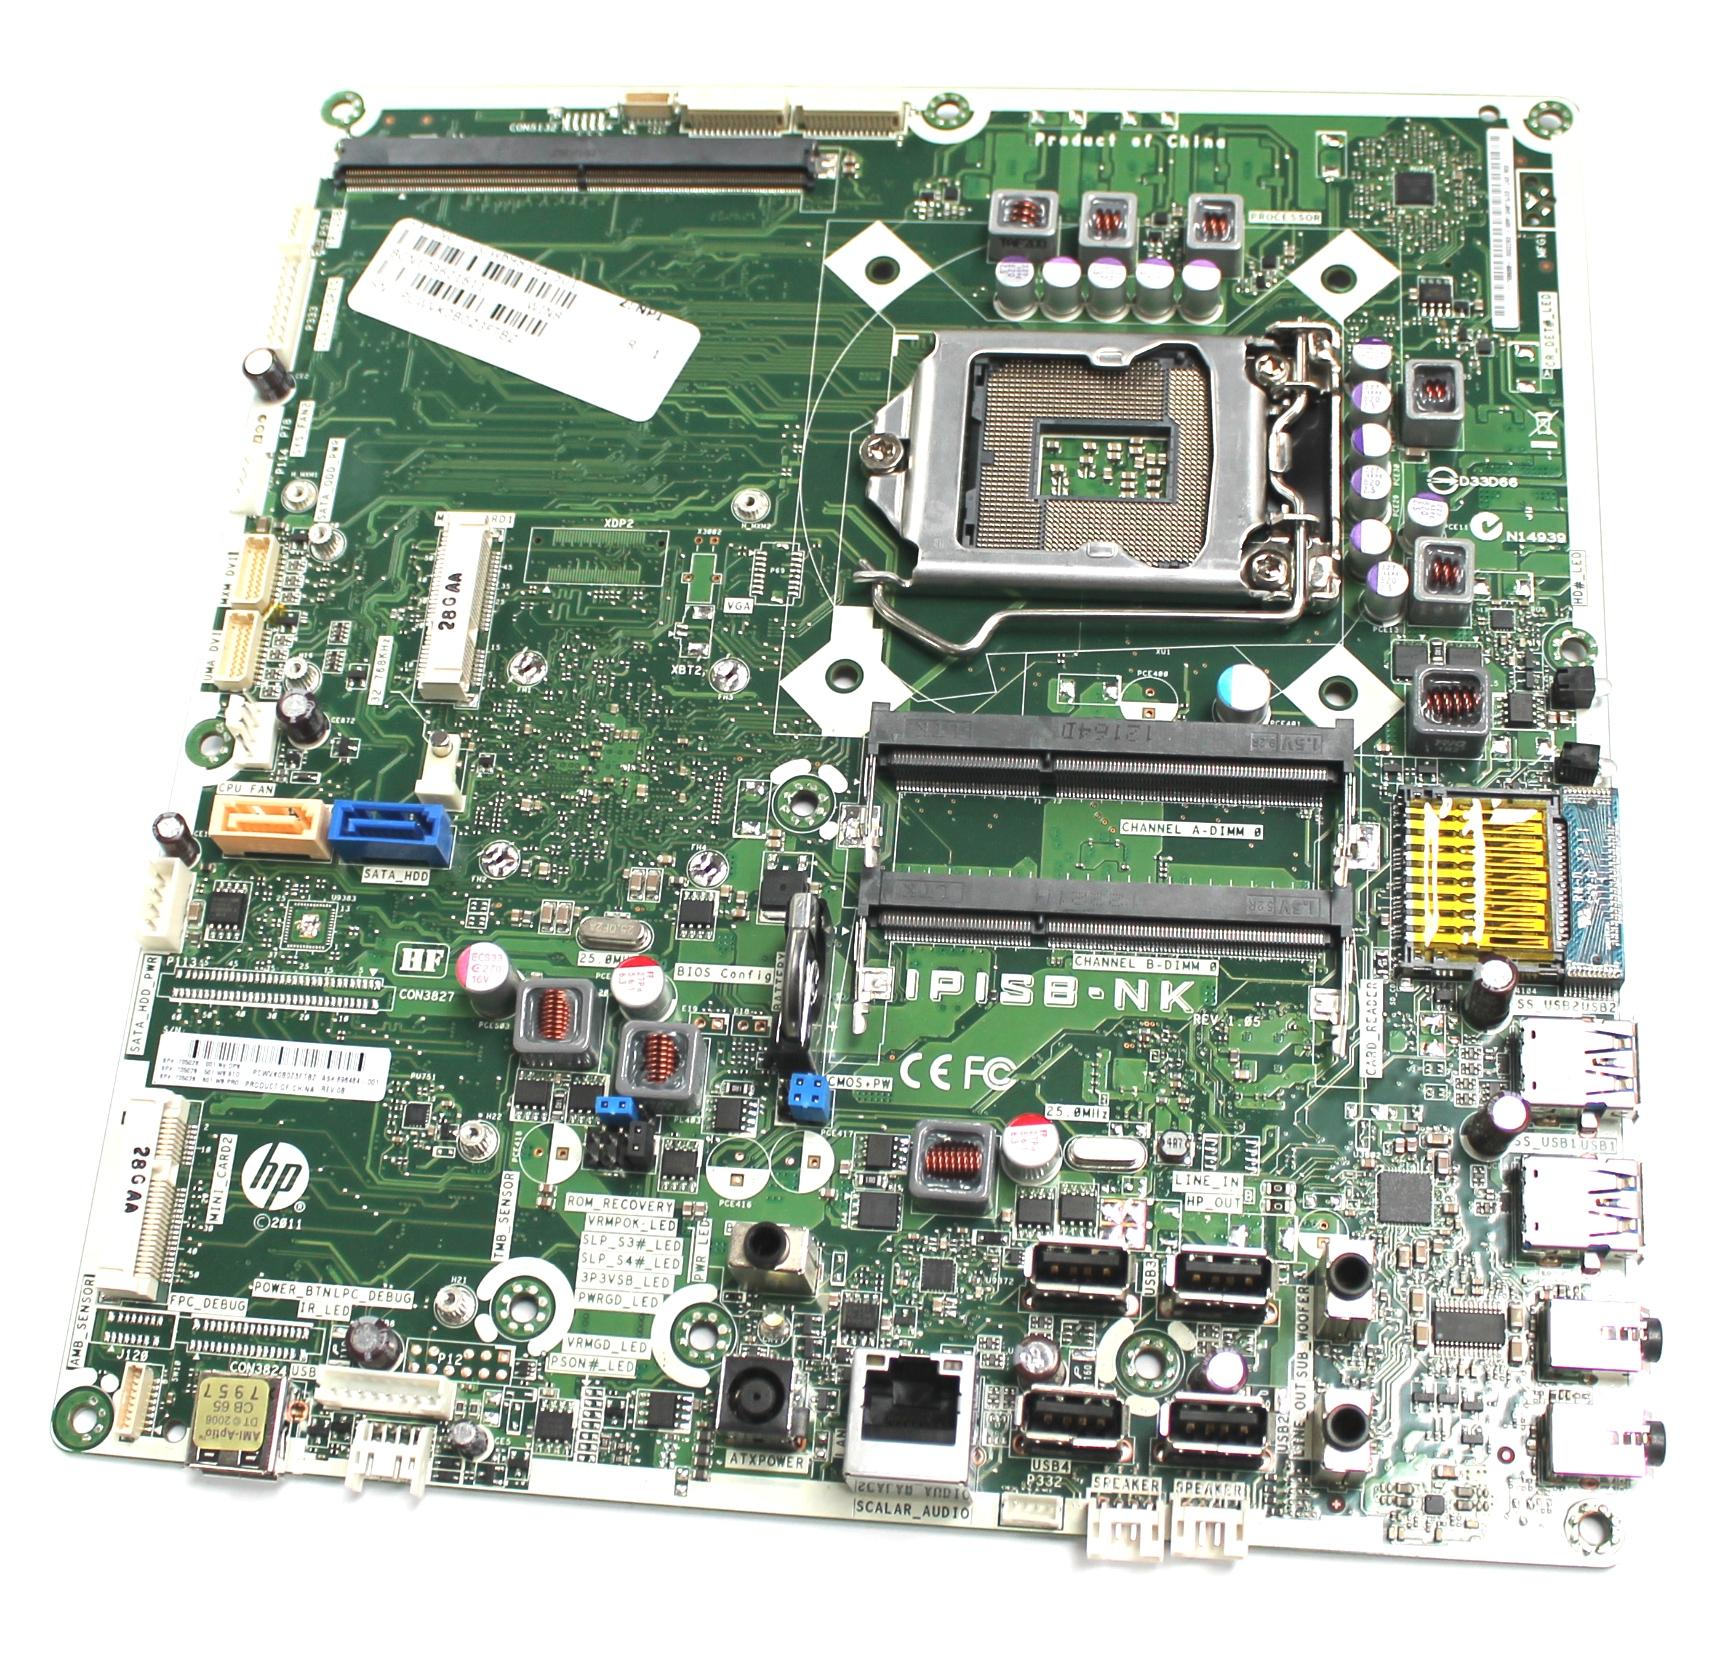 696484-001 IPISB-NK HP Touchsmart Motherboard LavacaSB